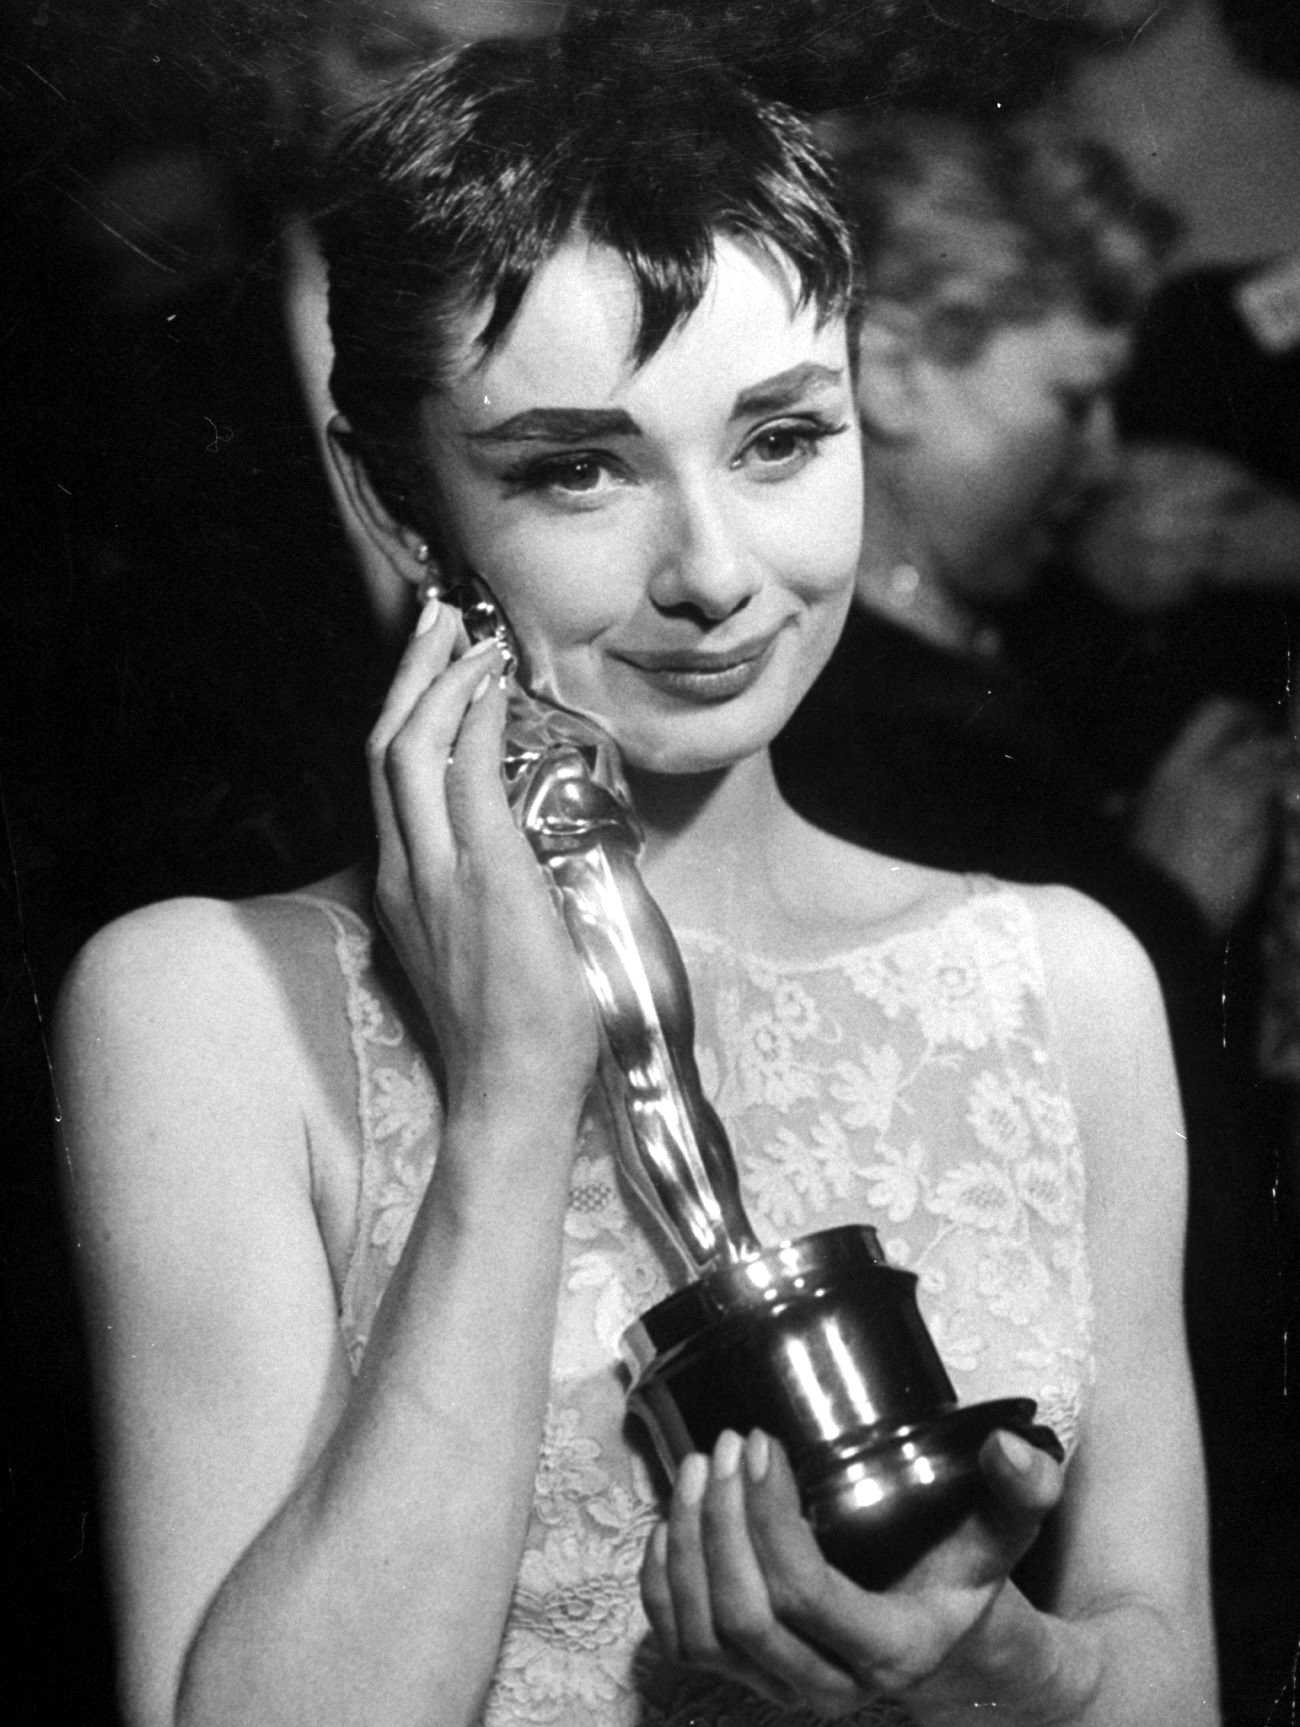 Audrey Hepburn Oscar Award 1954